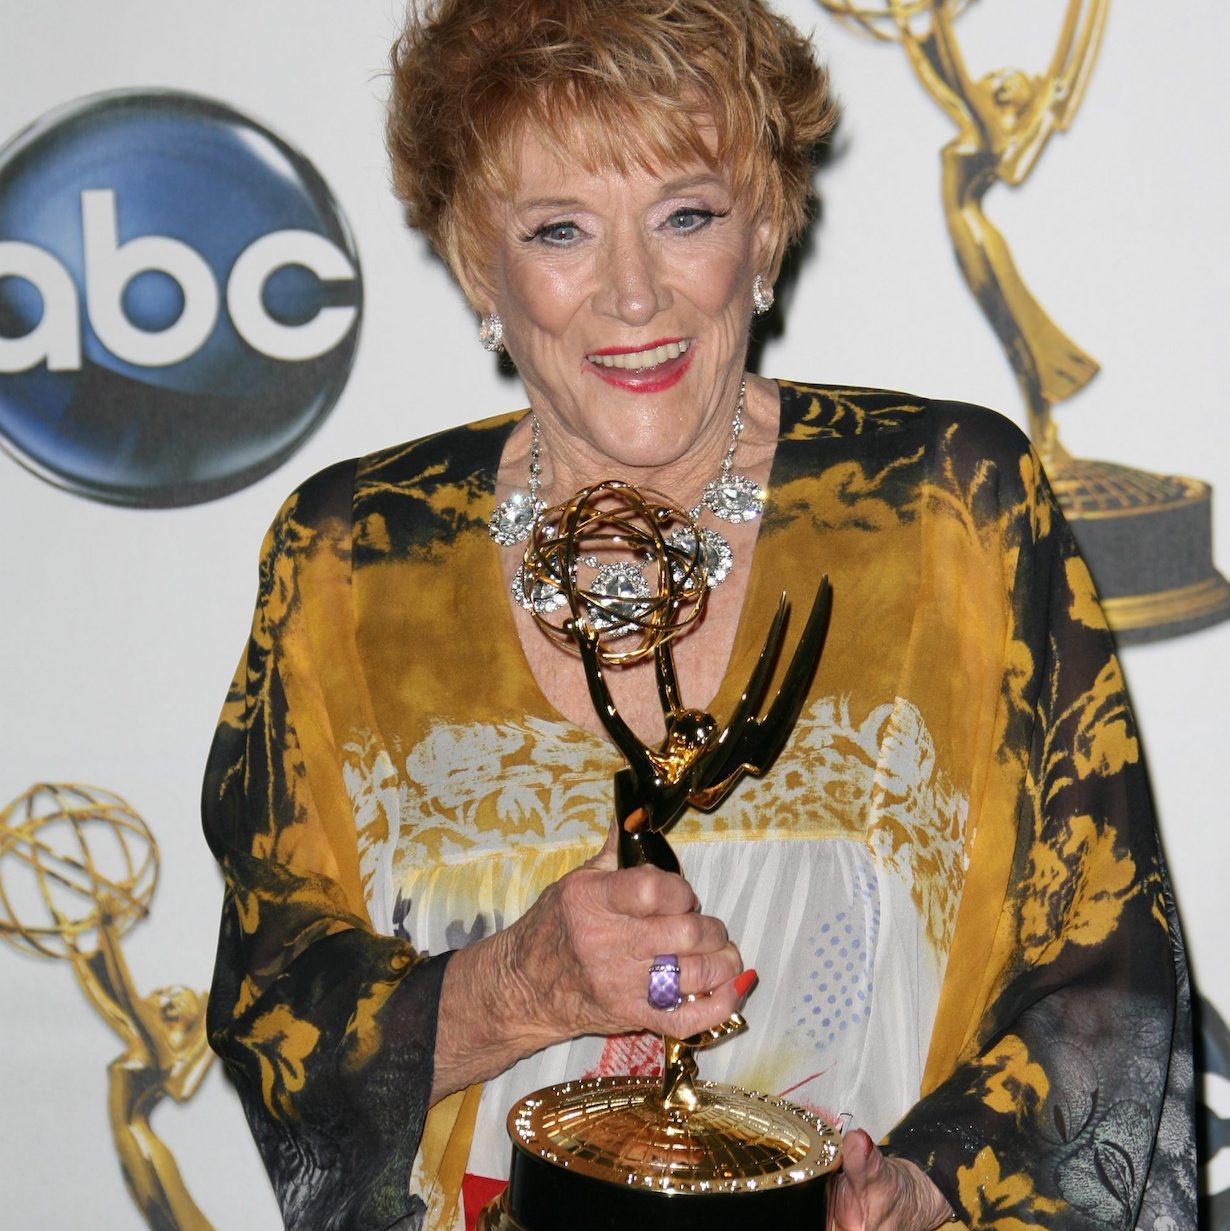 Jeanne Cooper35th Annual Daytime Emmy Awards - PressroomKodak TheatreHollywood, Ca.6/20/08©Jill Johnson/jpistudios.com310-657-9661